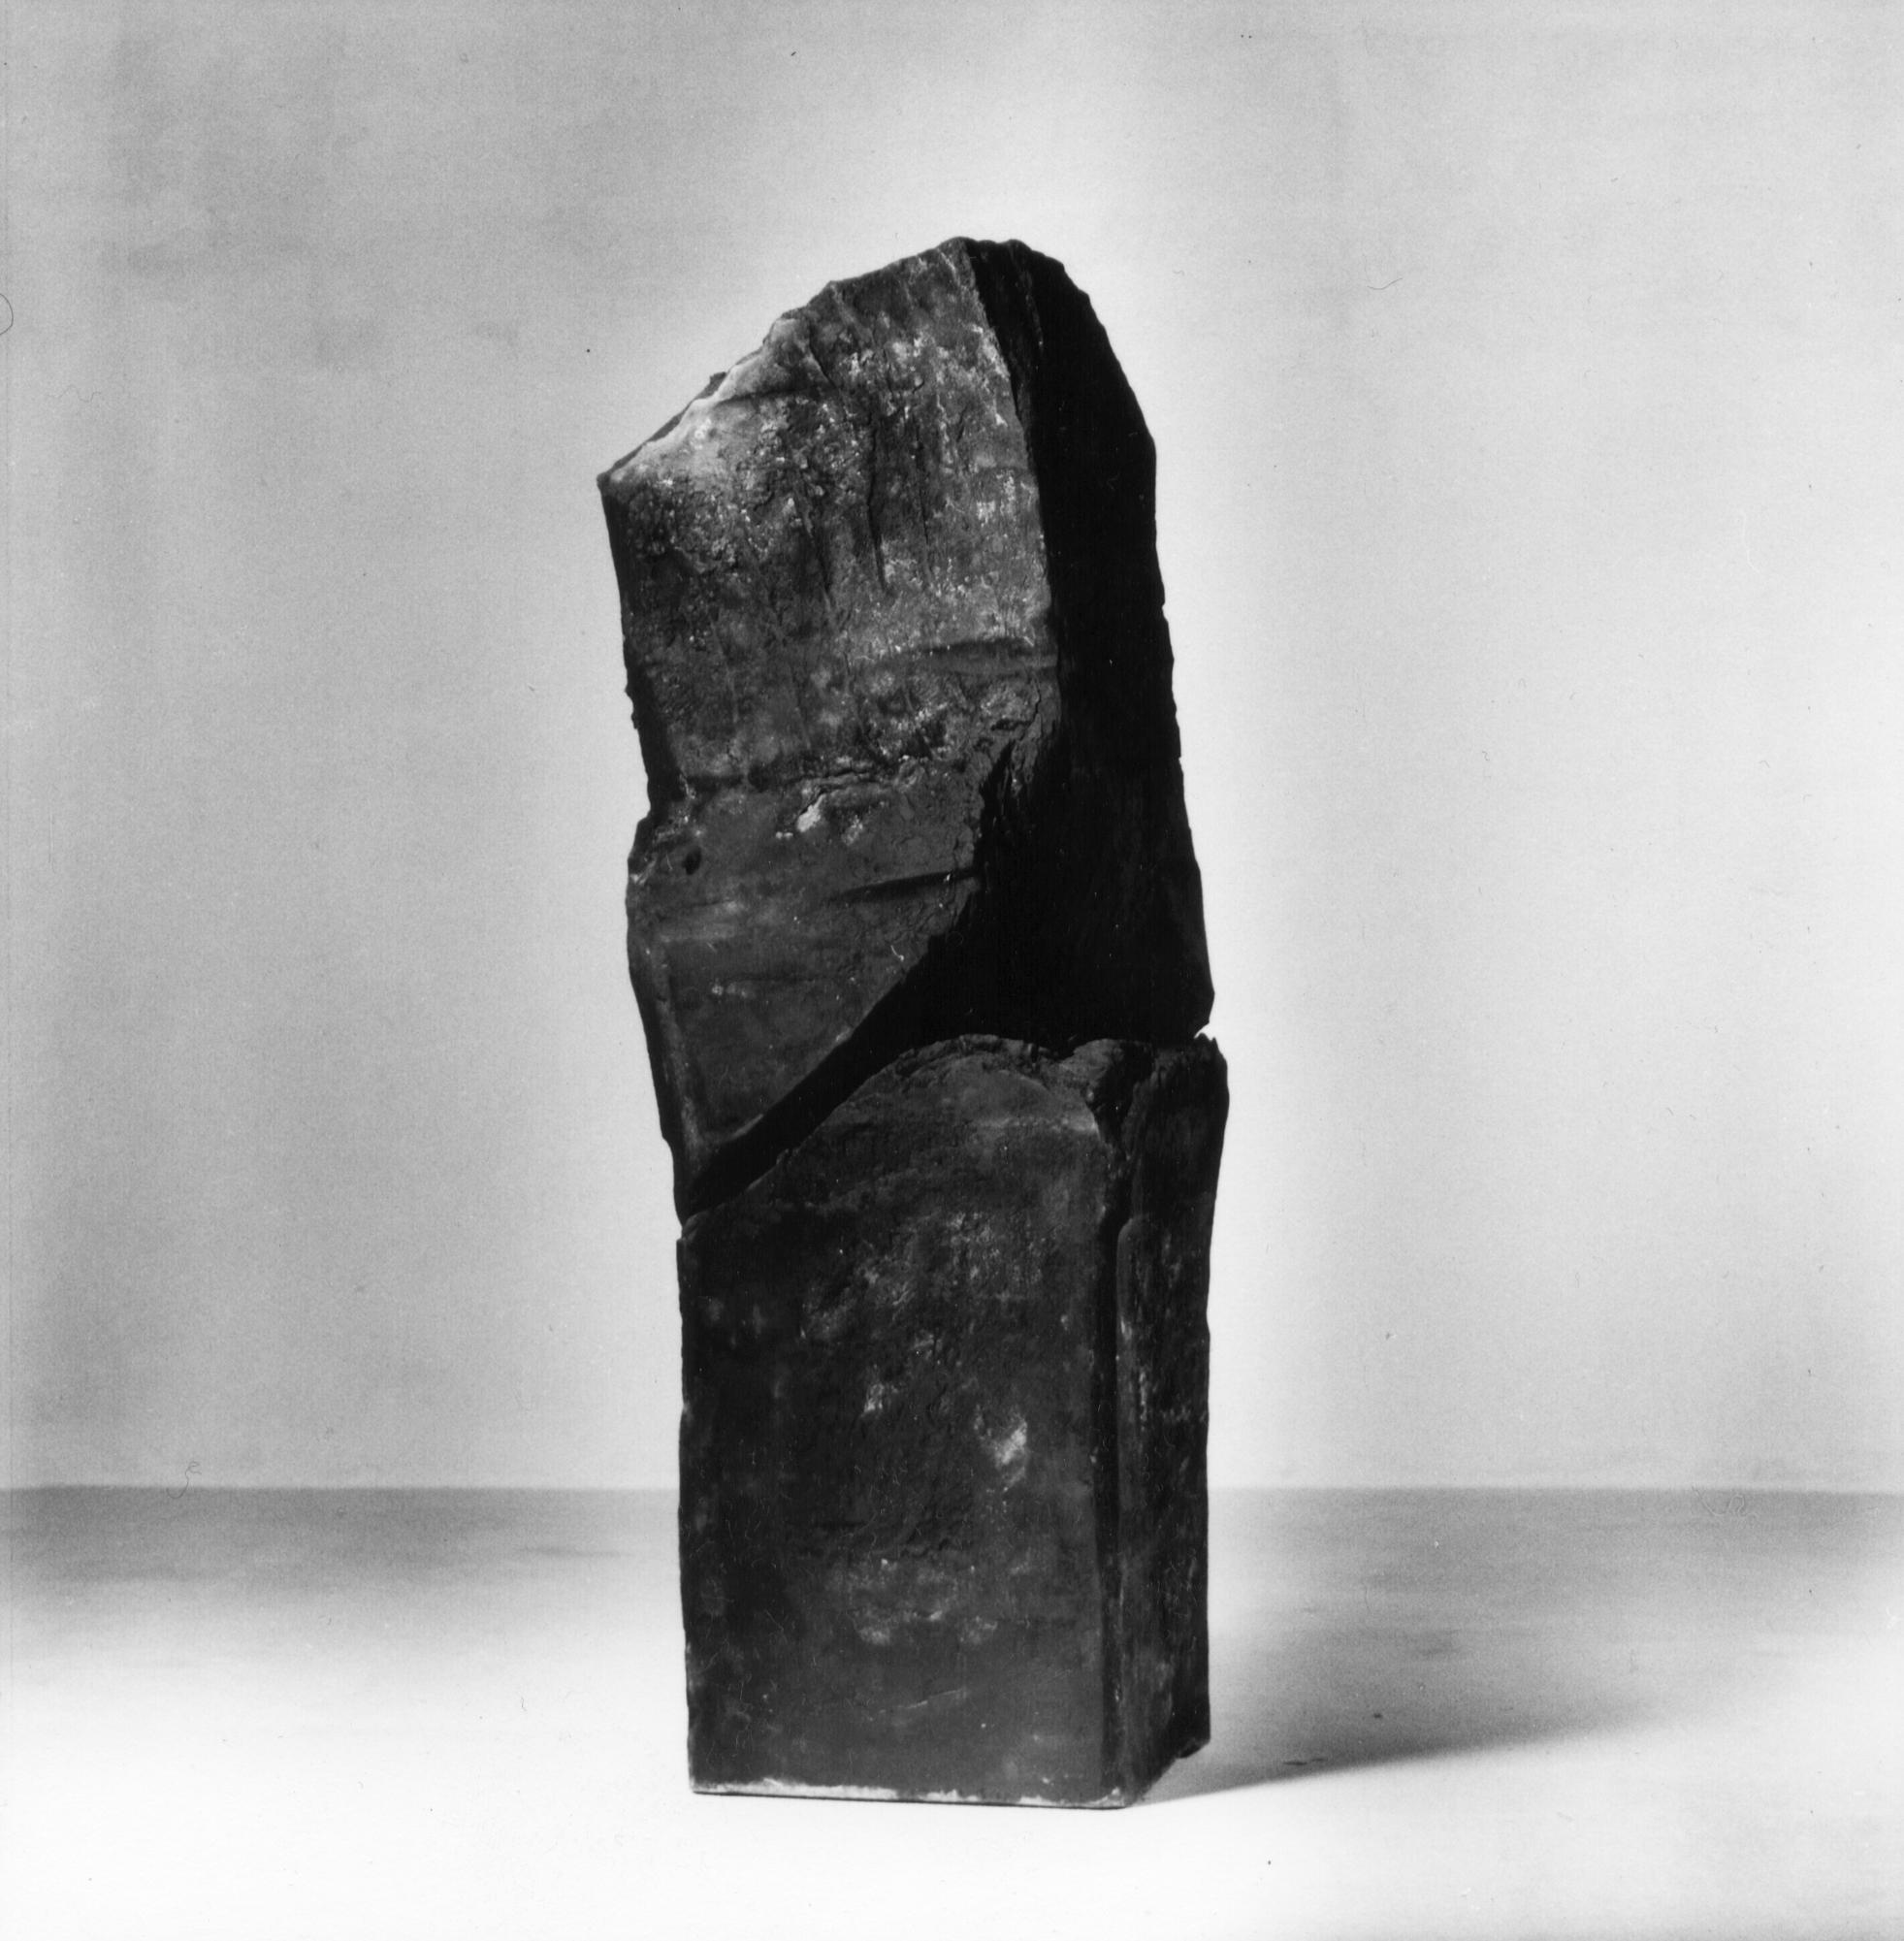 Giuseppe Spagnulo, Respiro, 1996 acciaio forgiato